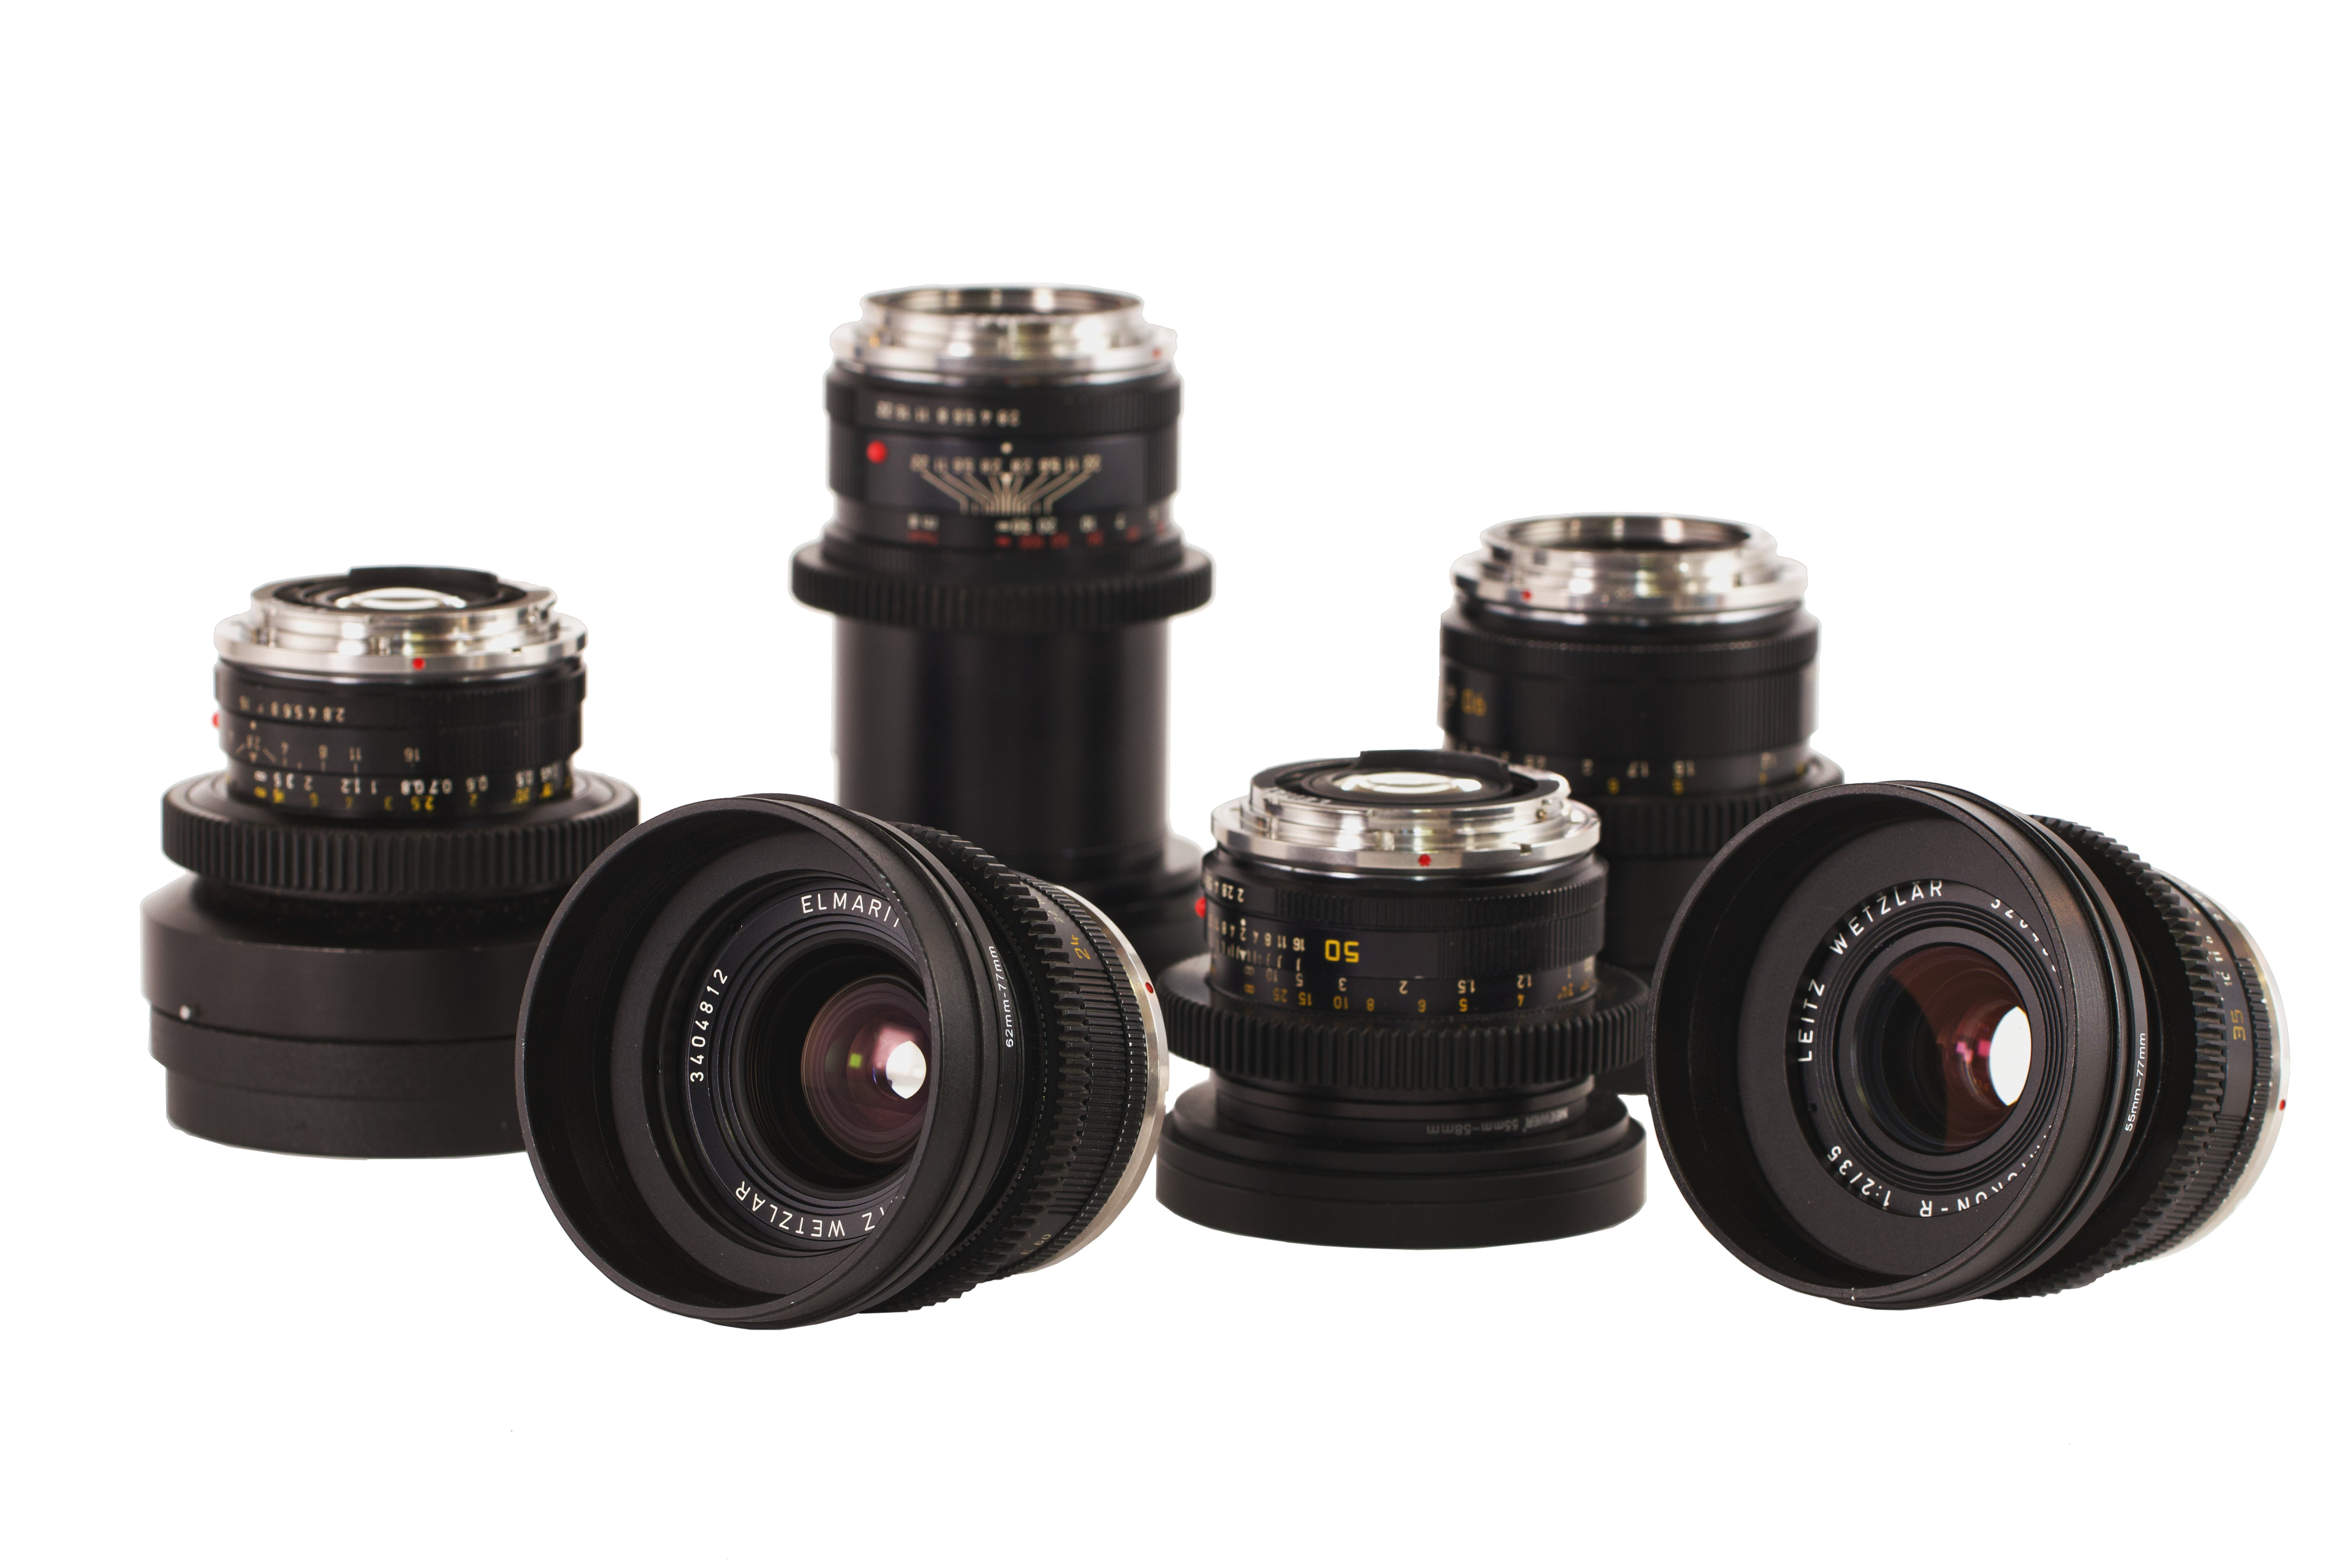 Leica R Cine-Mod Primes